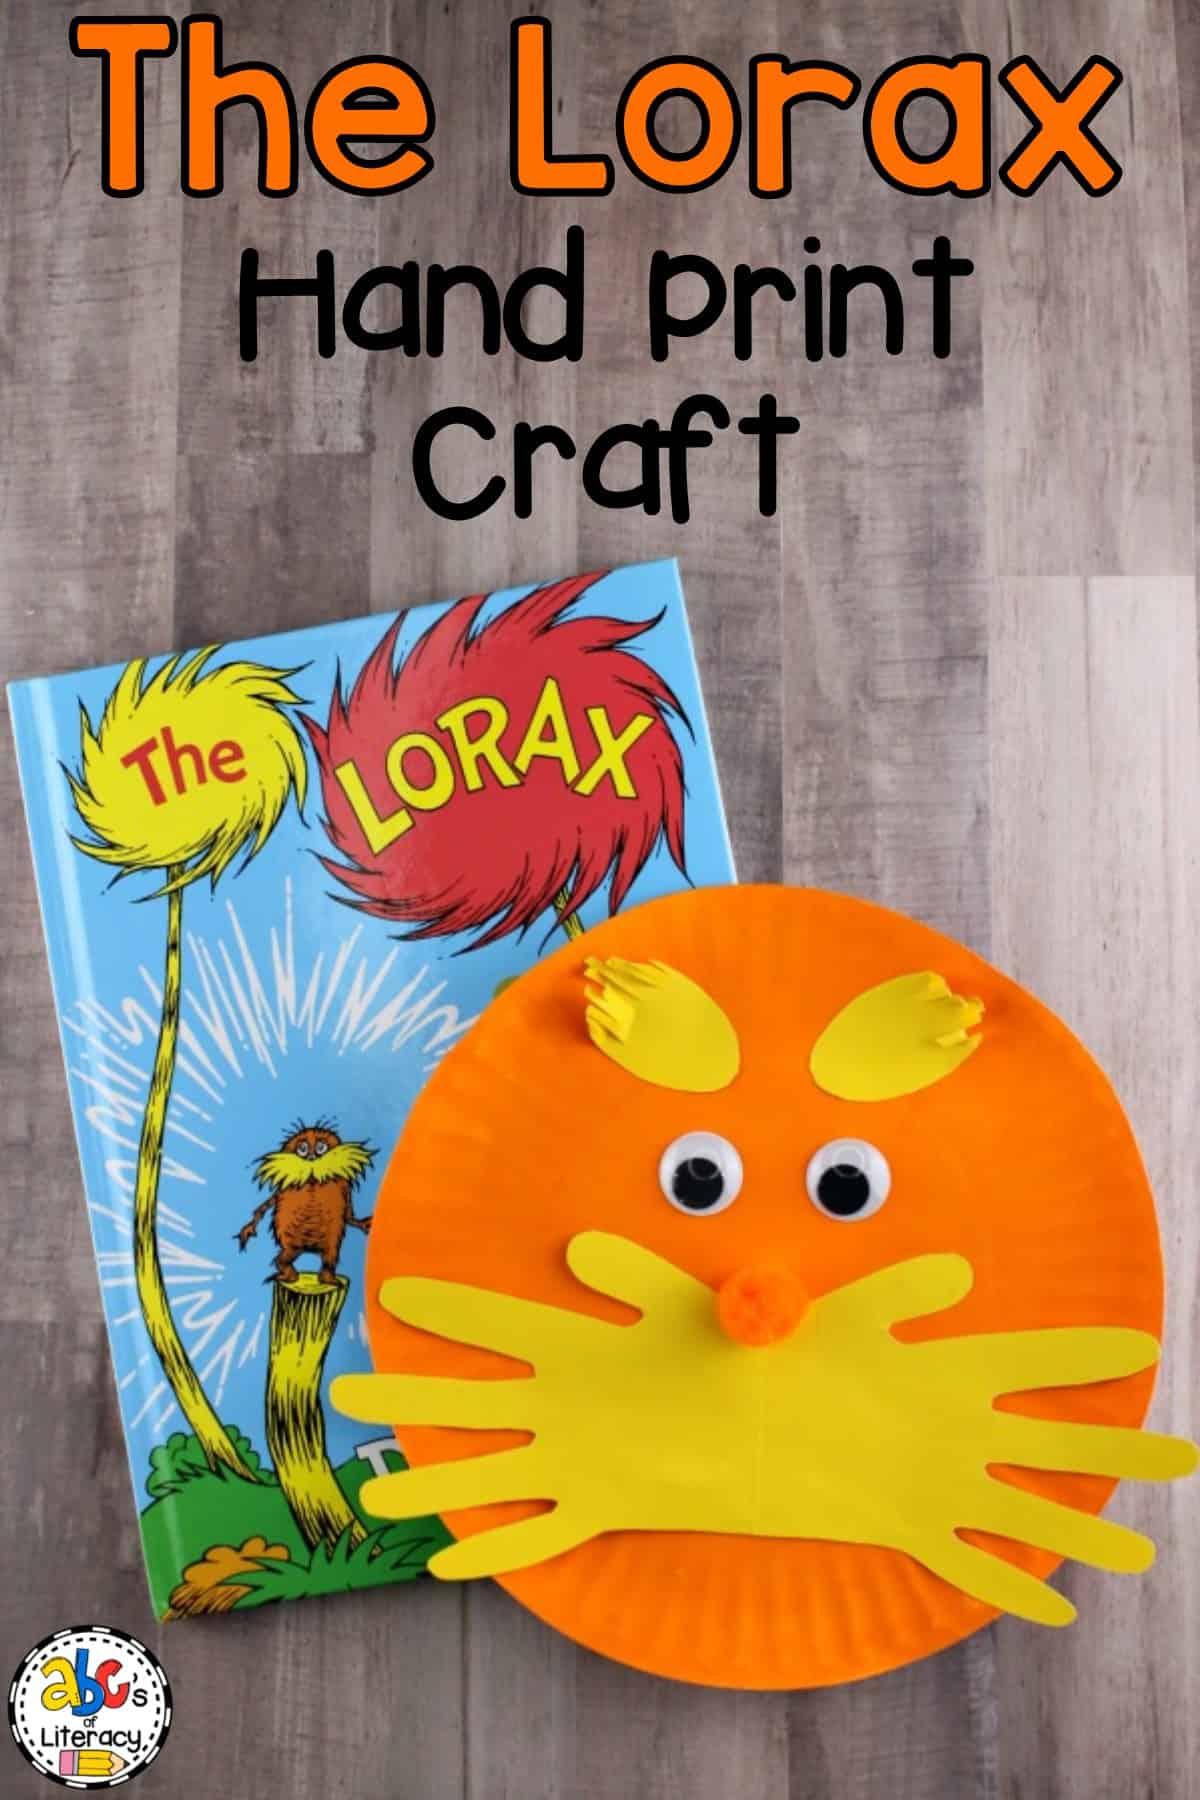 The Lorax Hand Print Craft